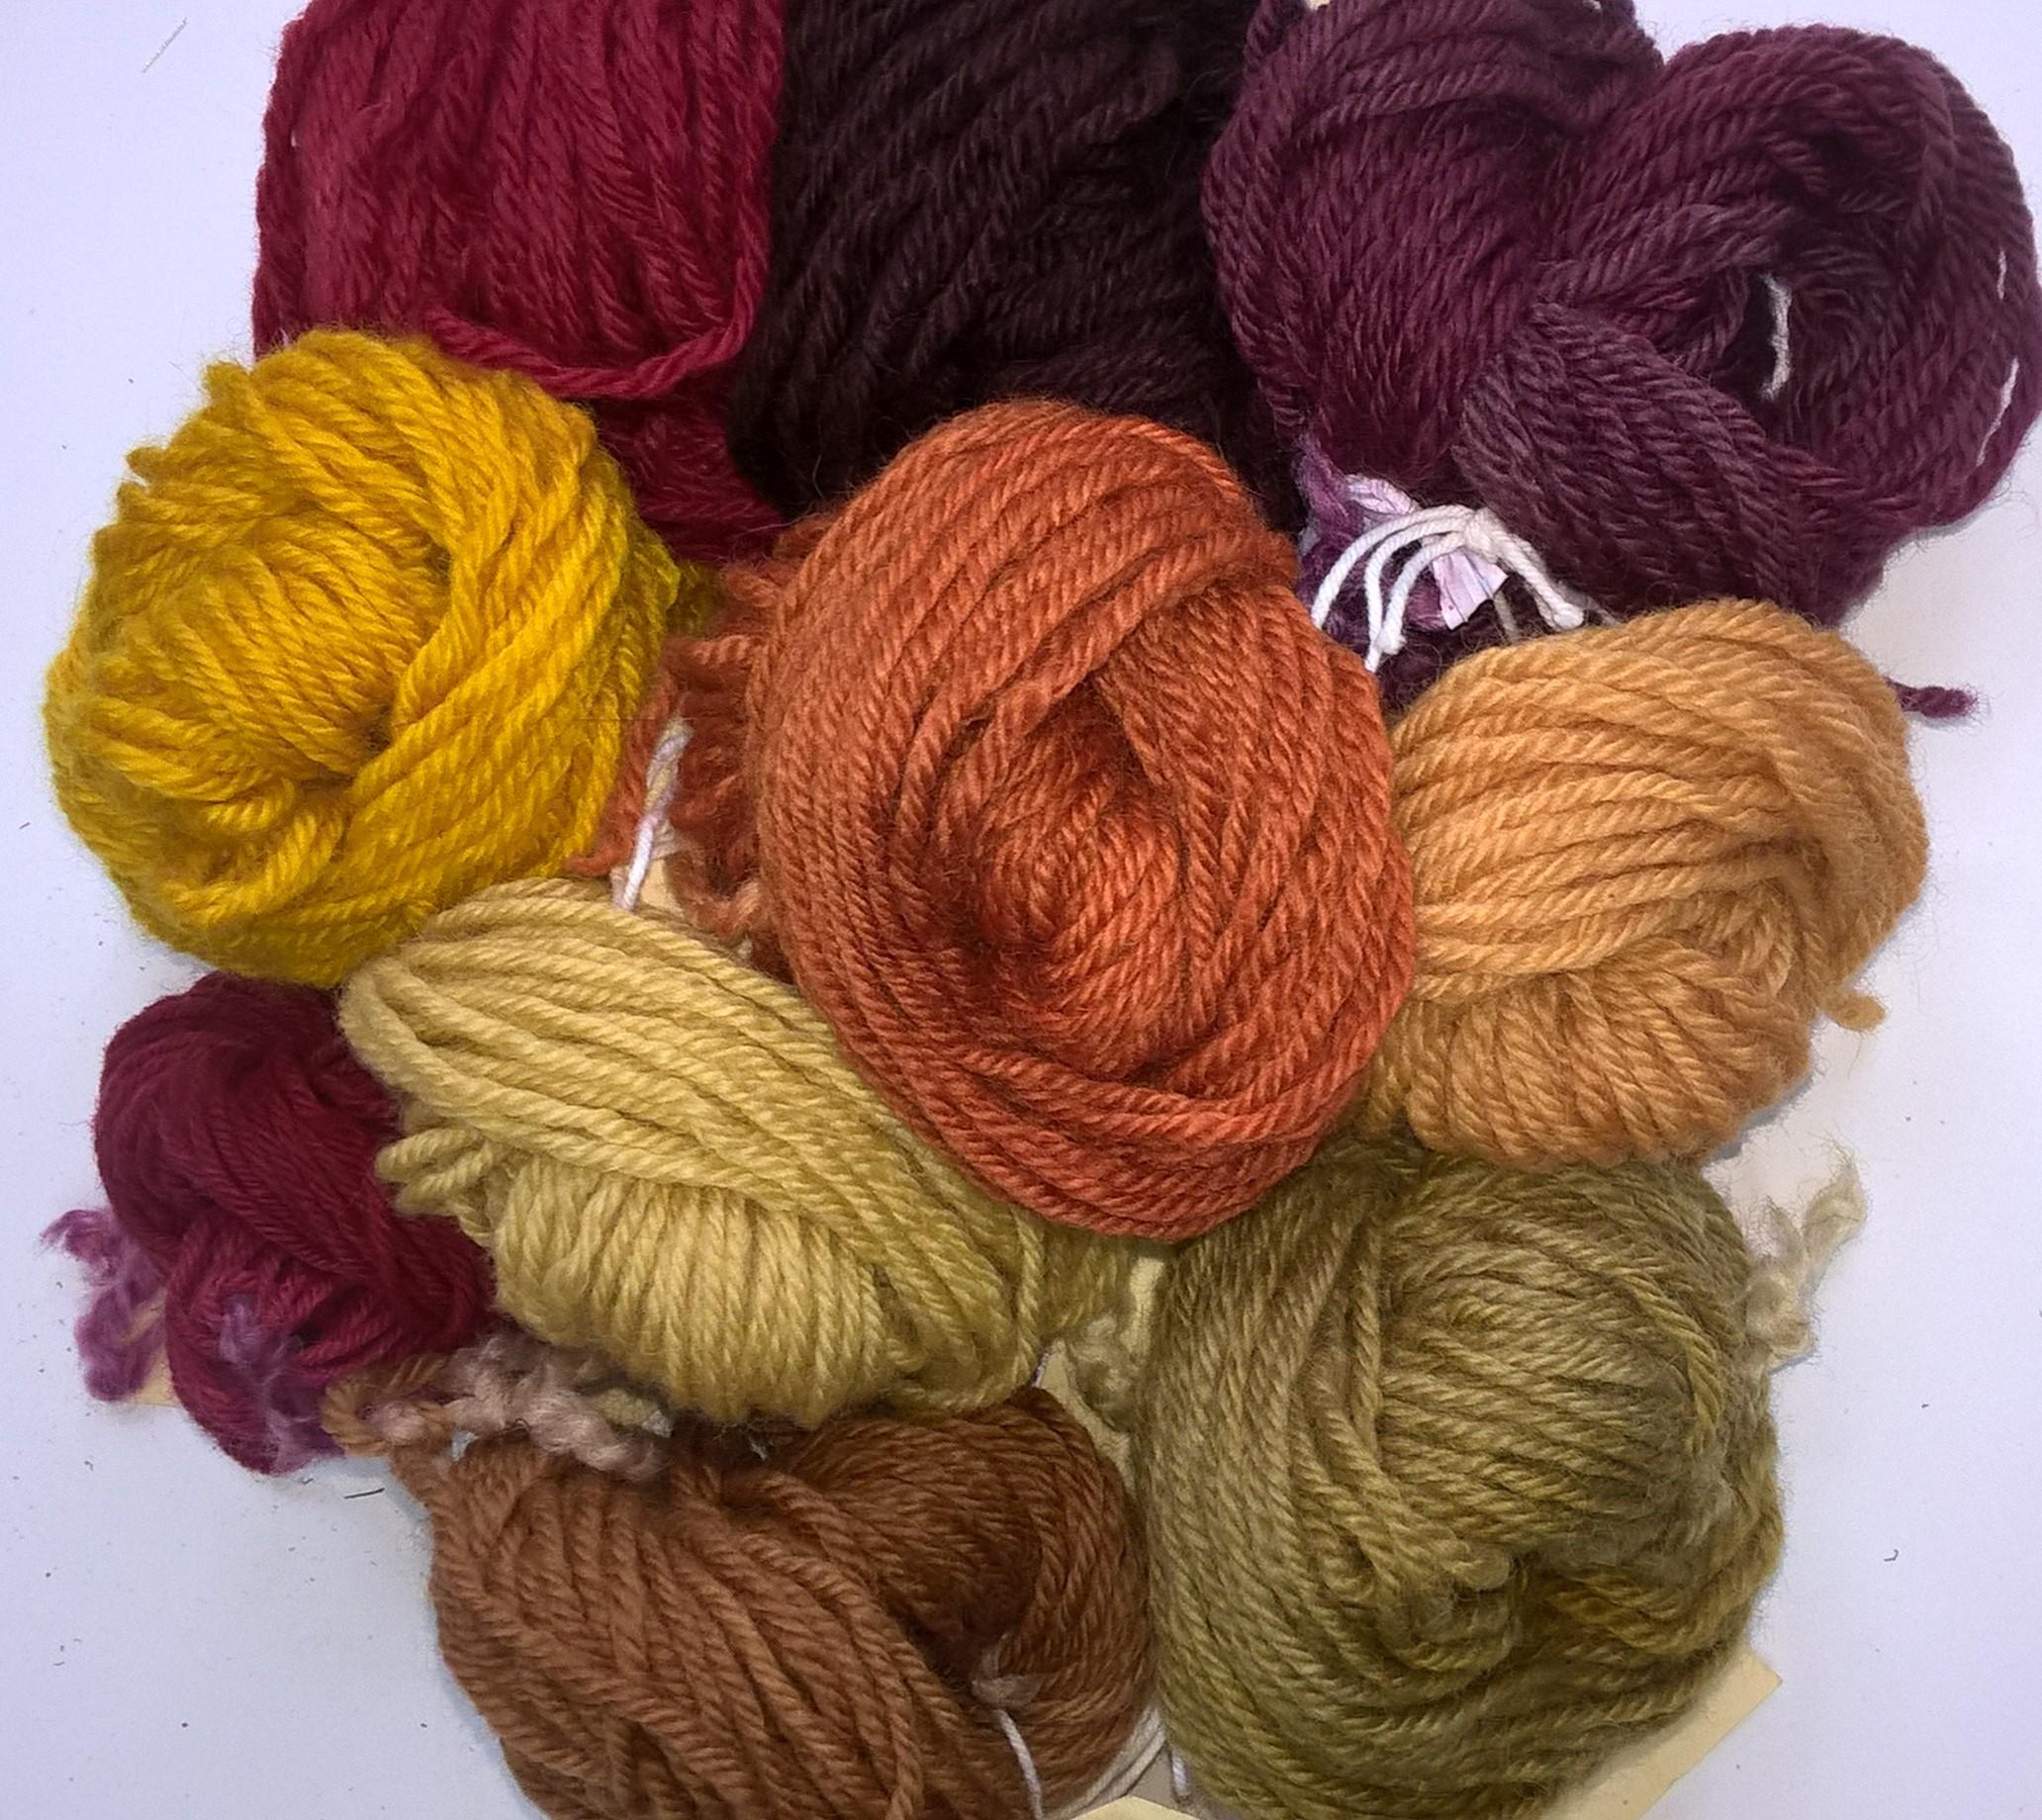 Natural dyes produced at workshop on 15th September